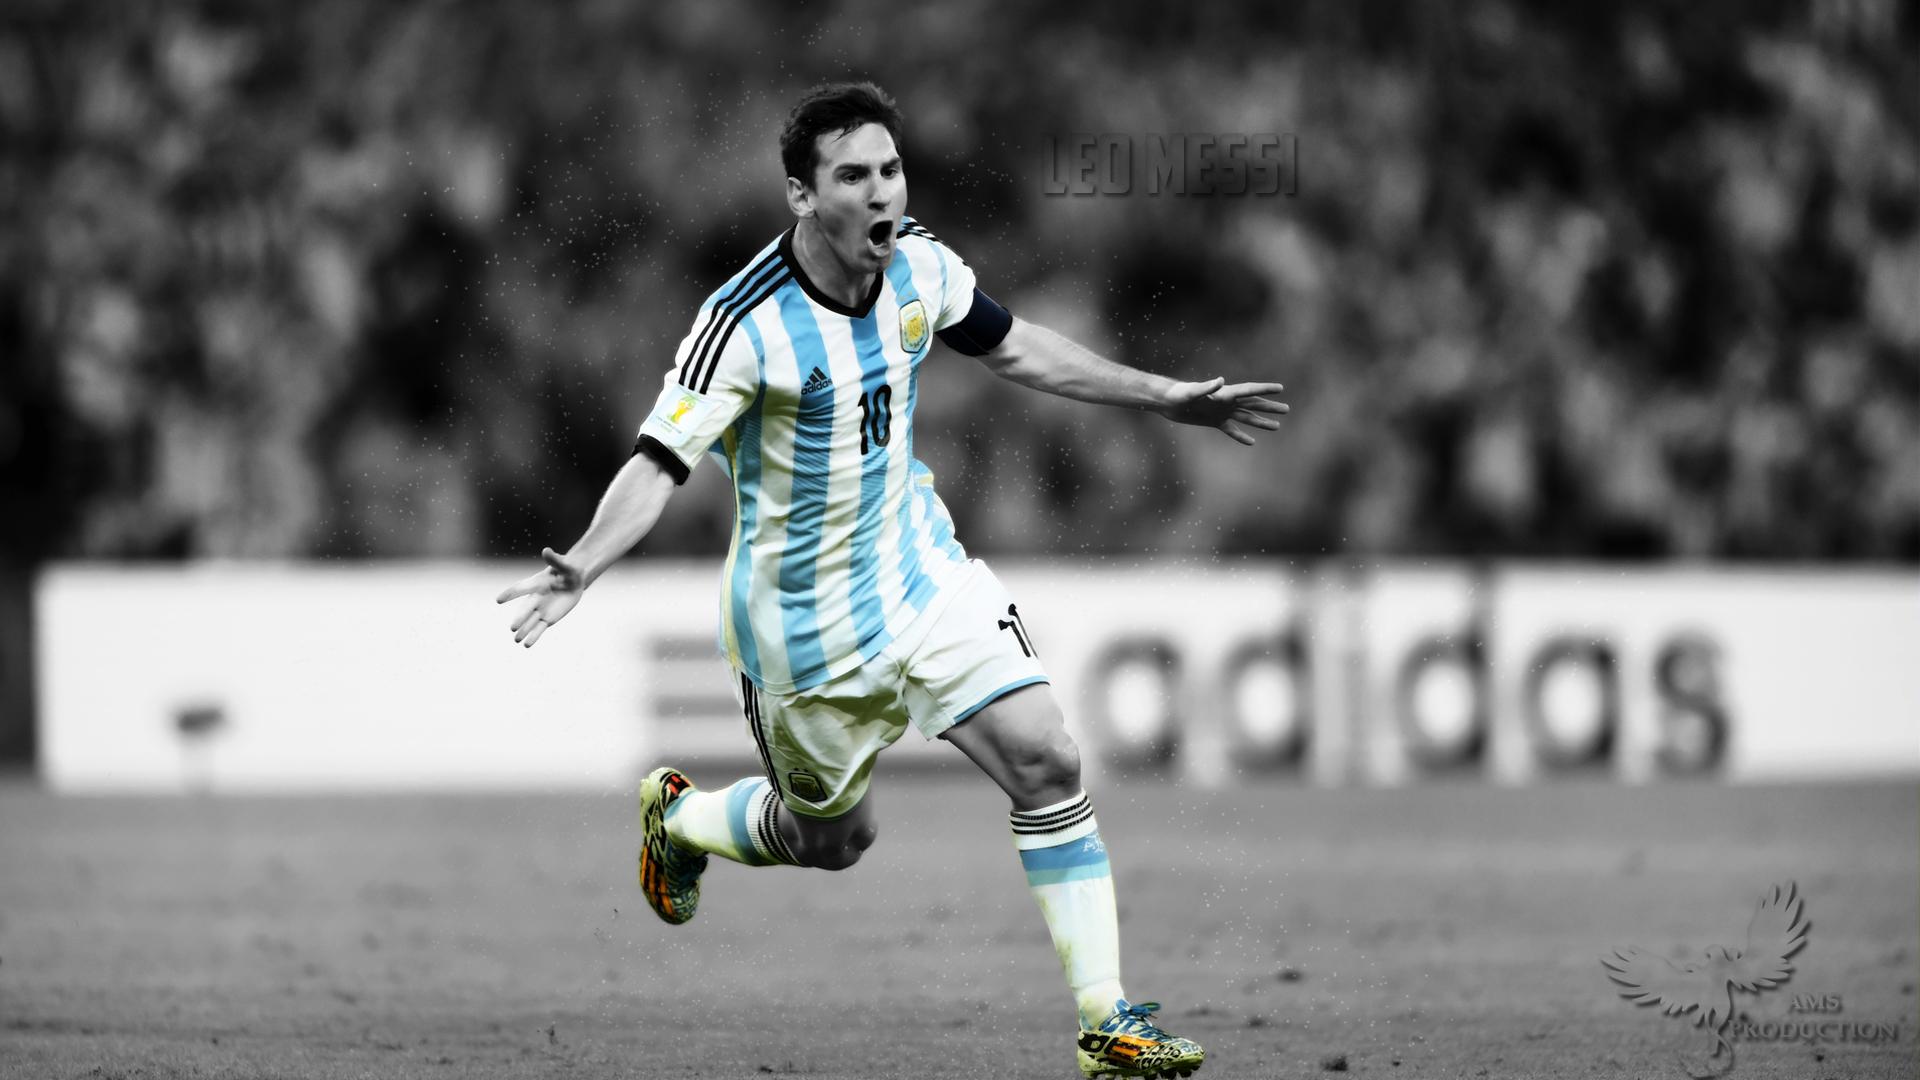 World Best Sports Cars Wallpapers Messi Argentina Wallpapers Background Hd Pixelstalk Net